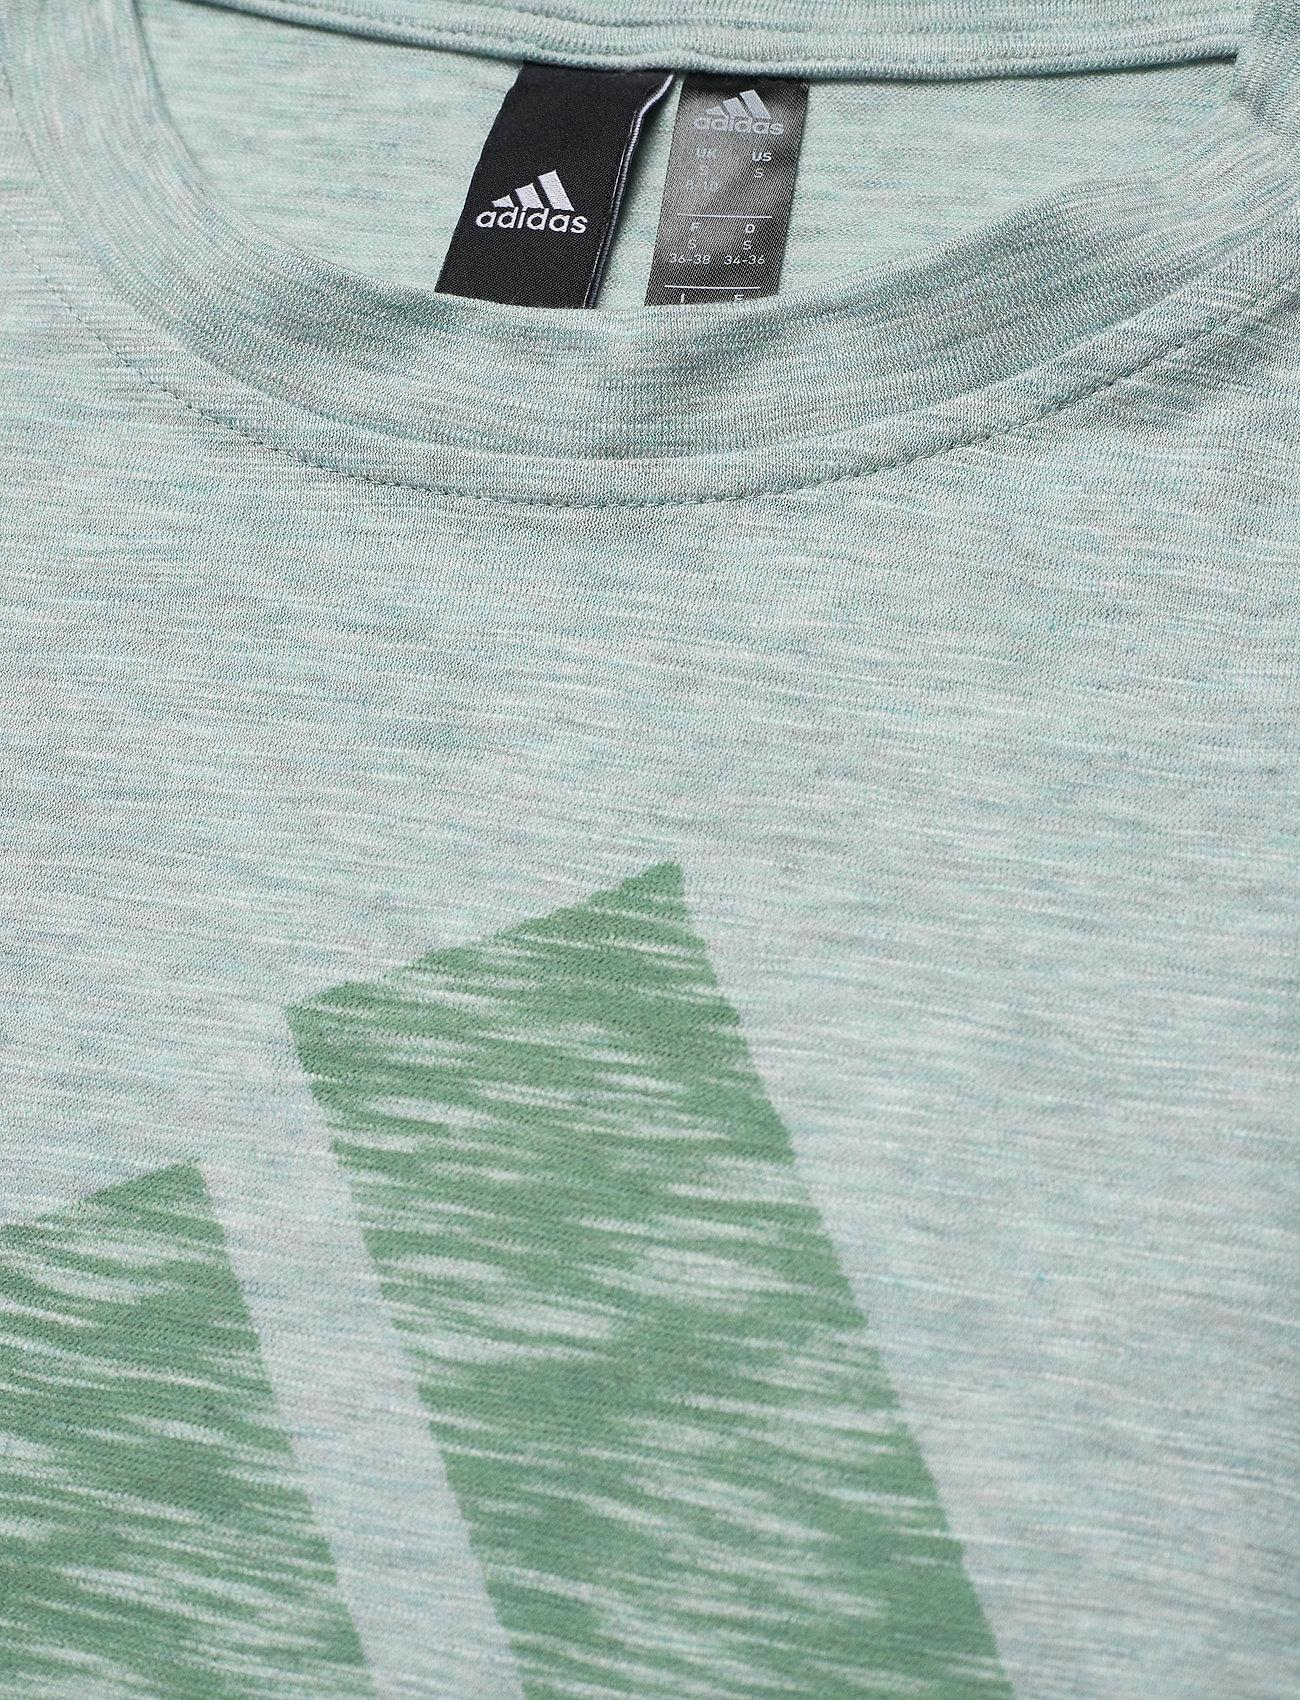 W Winners Tank (Grtime) (23.96 €) - adidas Performance mkcUc